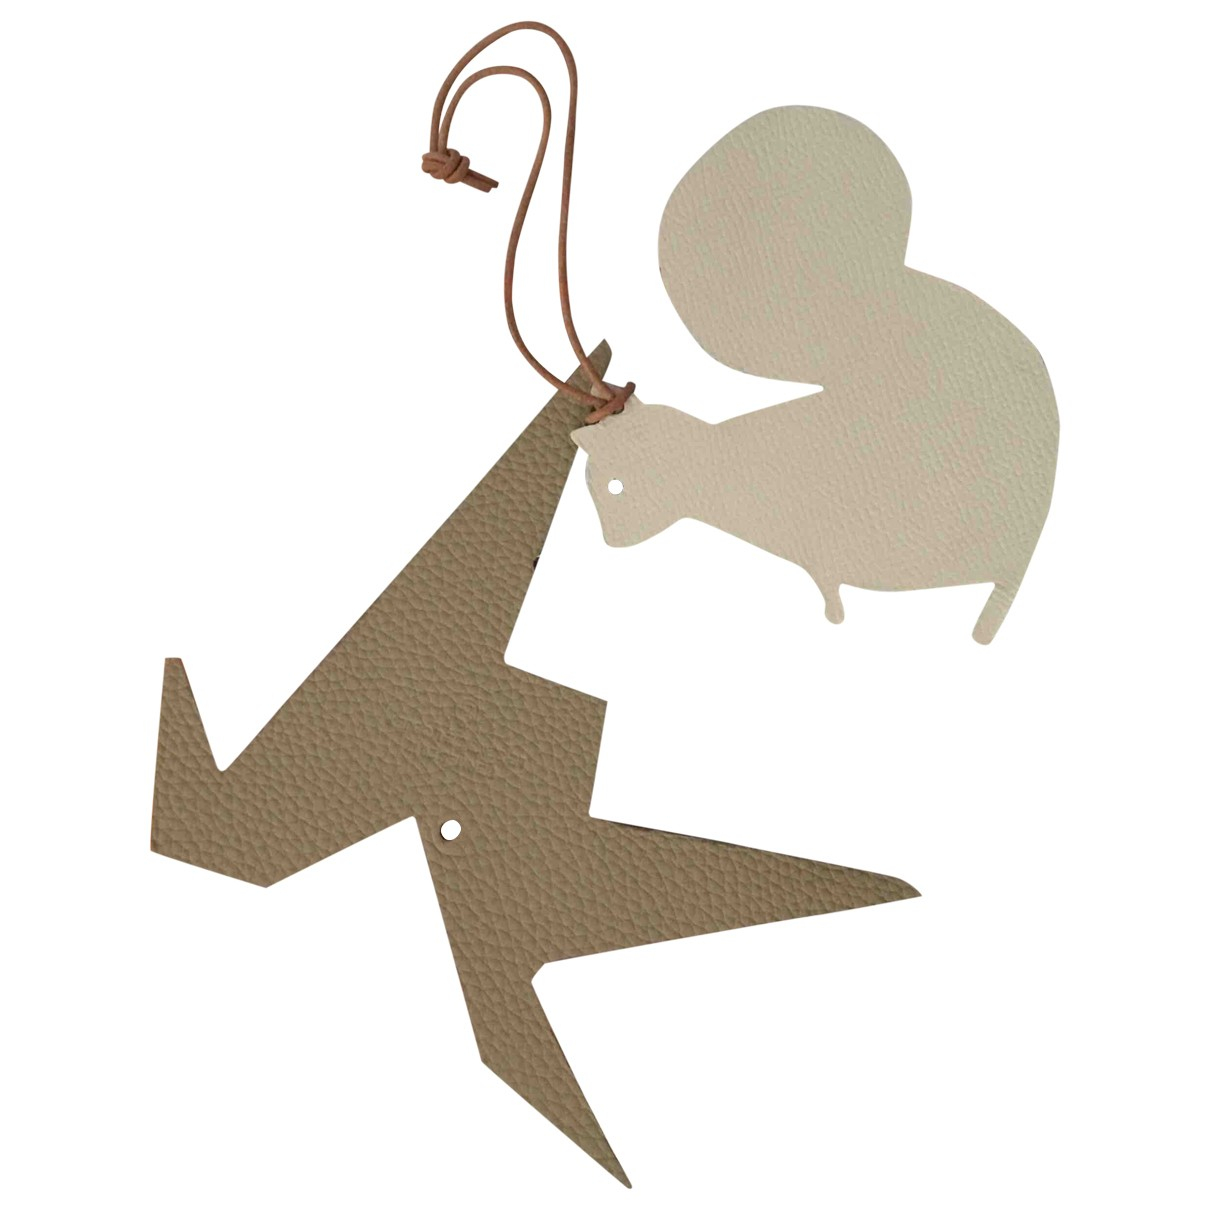 Hermes - Petite maroquinerie   pour femme en cuir - beige